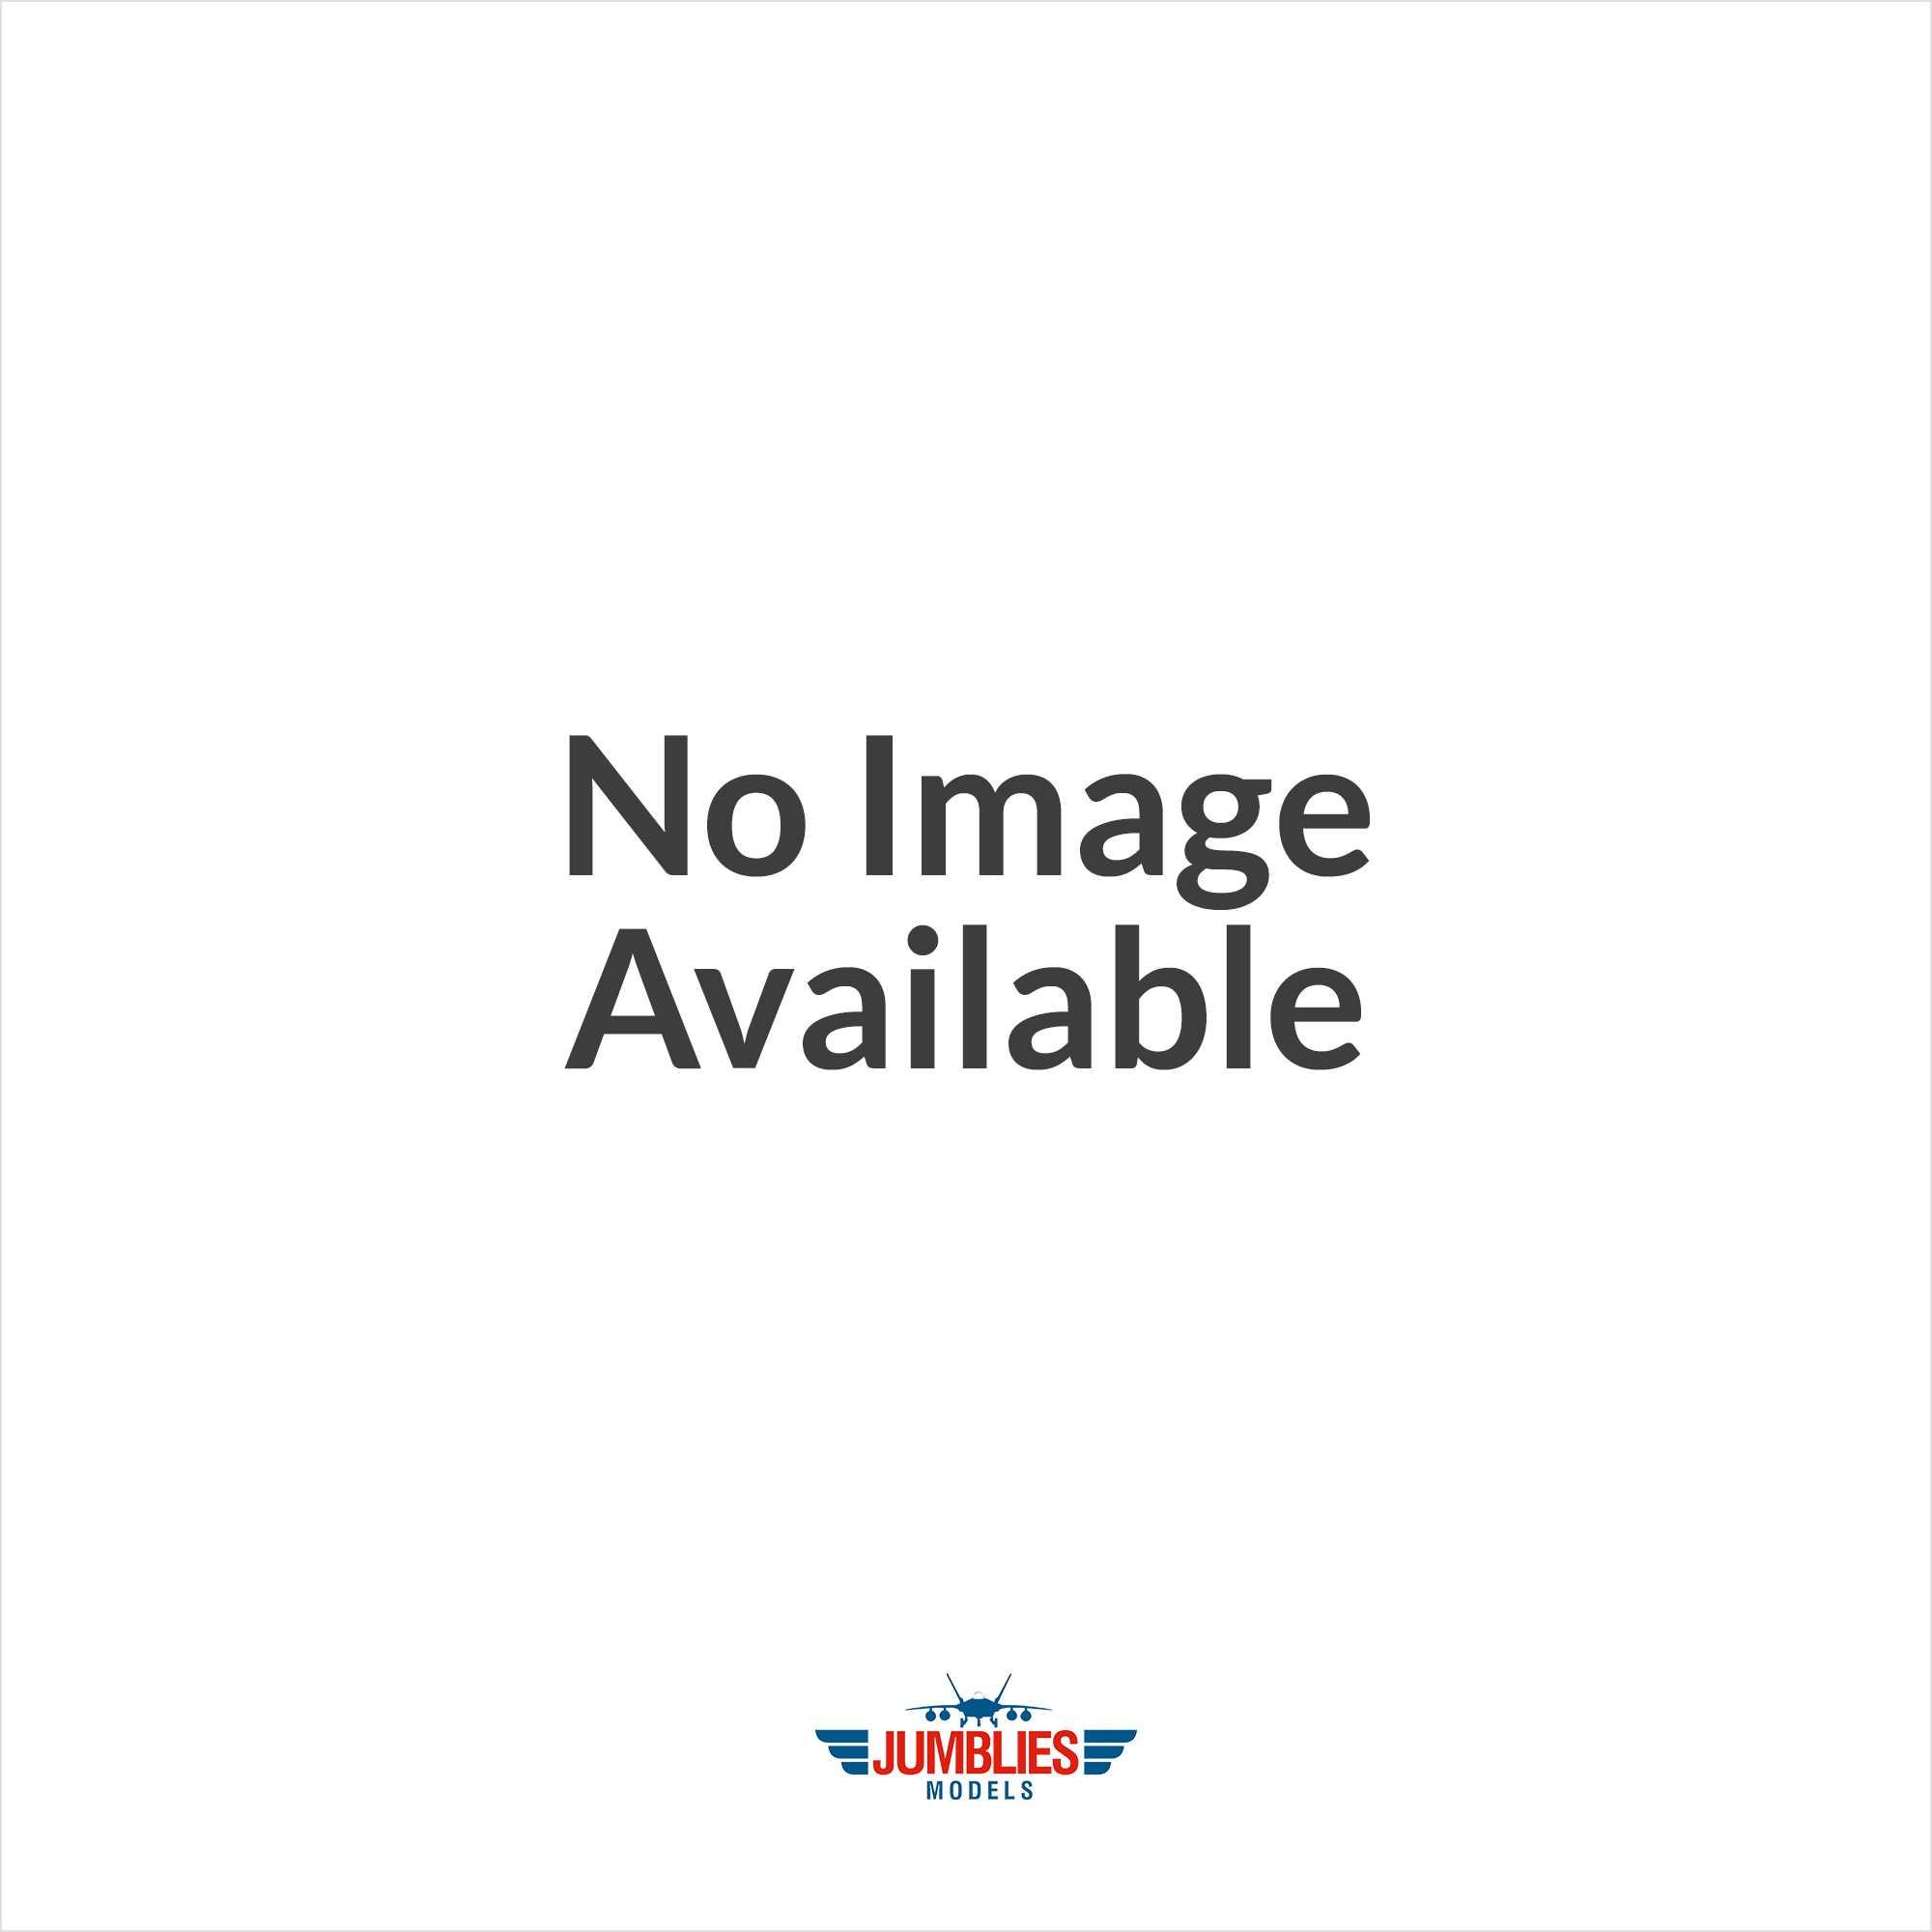 Corgi Damaged Box - No Down Wheels - 1:72 B-17 Flying Fortress 42-9780 'Little Miss Mischief' 324th BS, 91st BG